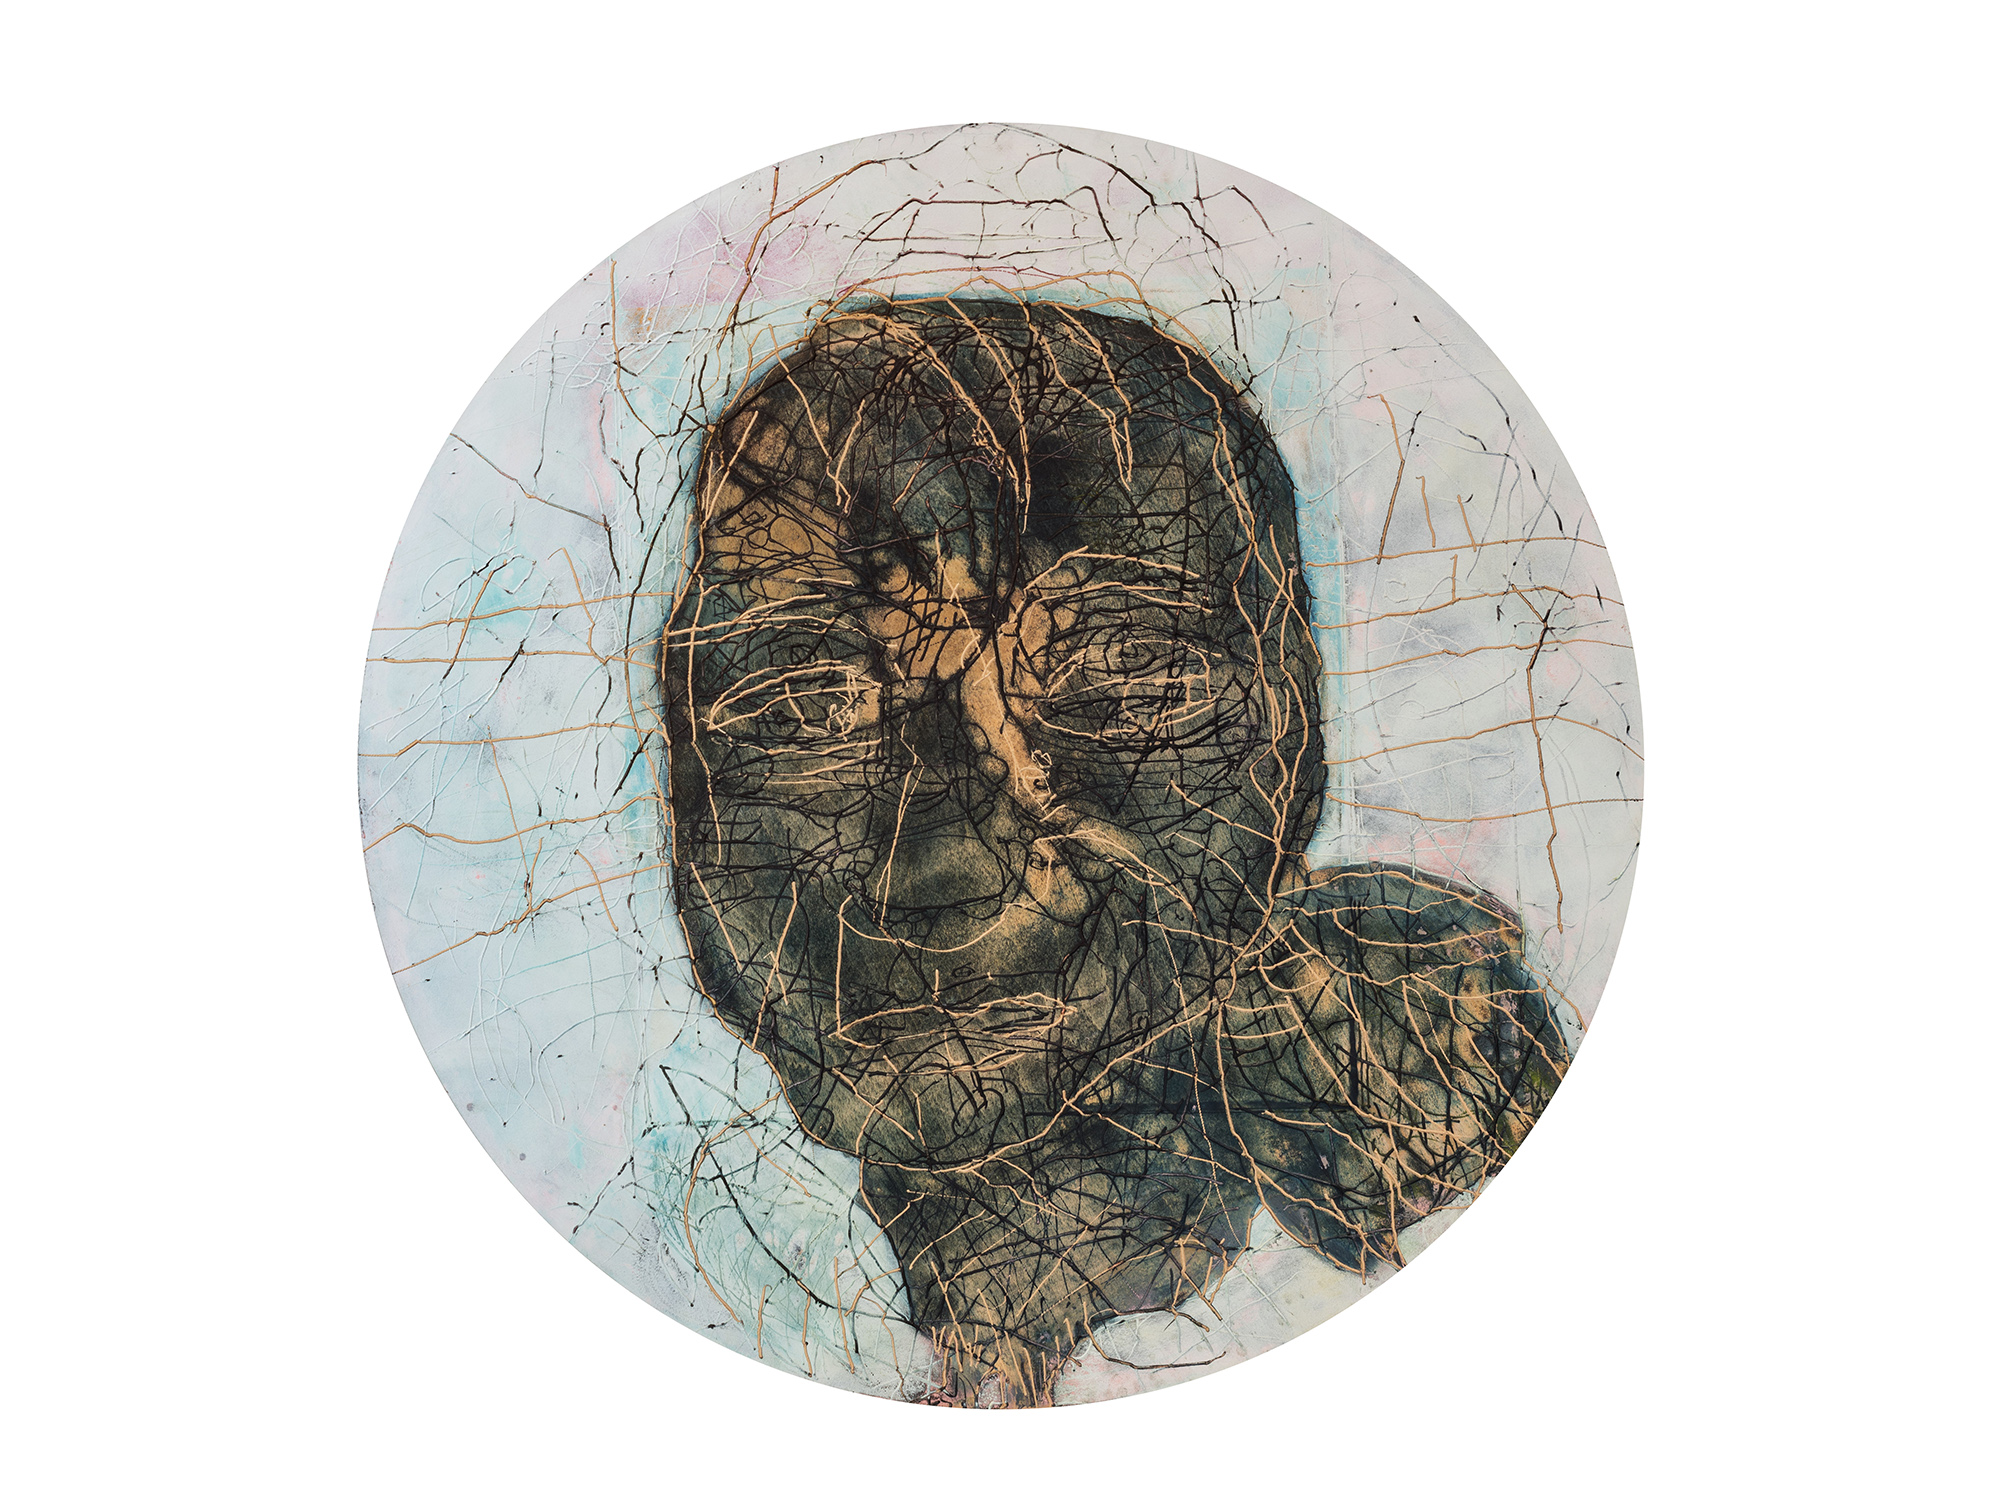 Robert Doble   Portrait of Francis Bacon - The Alienist , 2018 oil on archival marine ply diameter: 110cm   ARTIST BIO